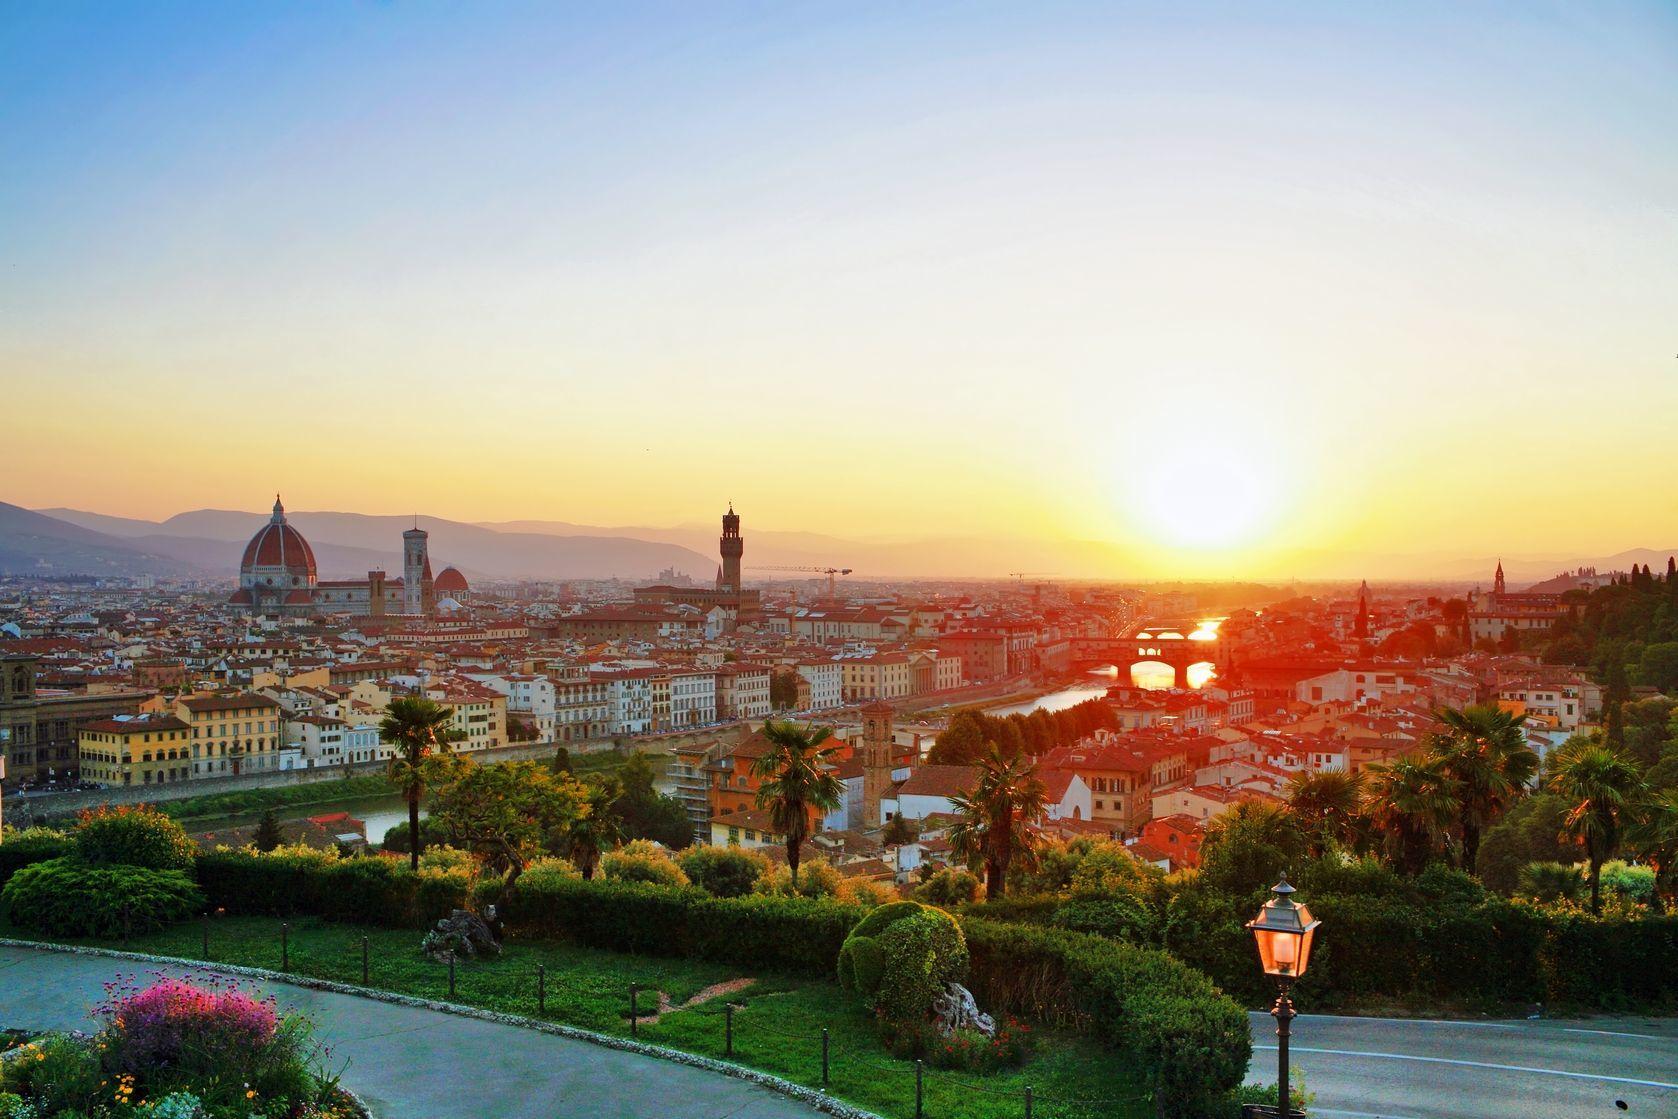 Západ slunce s výhledem na Florencii | off/123RF.com